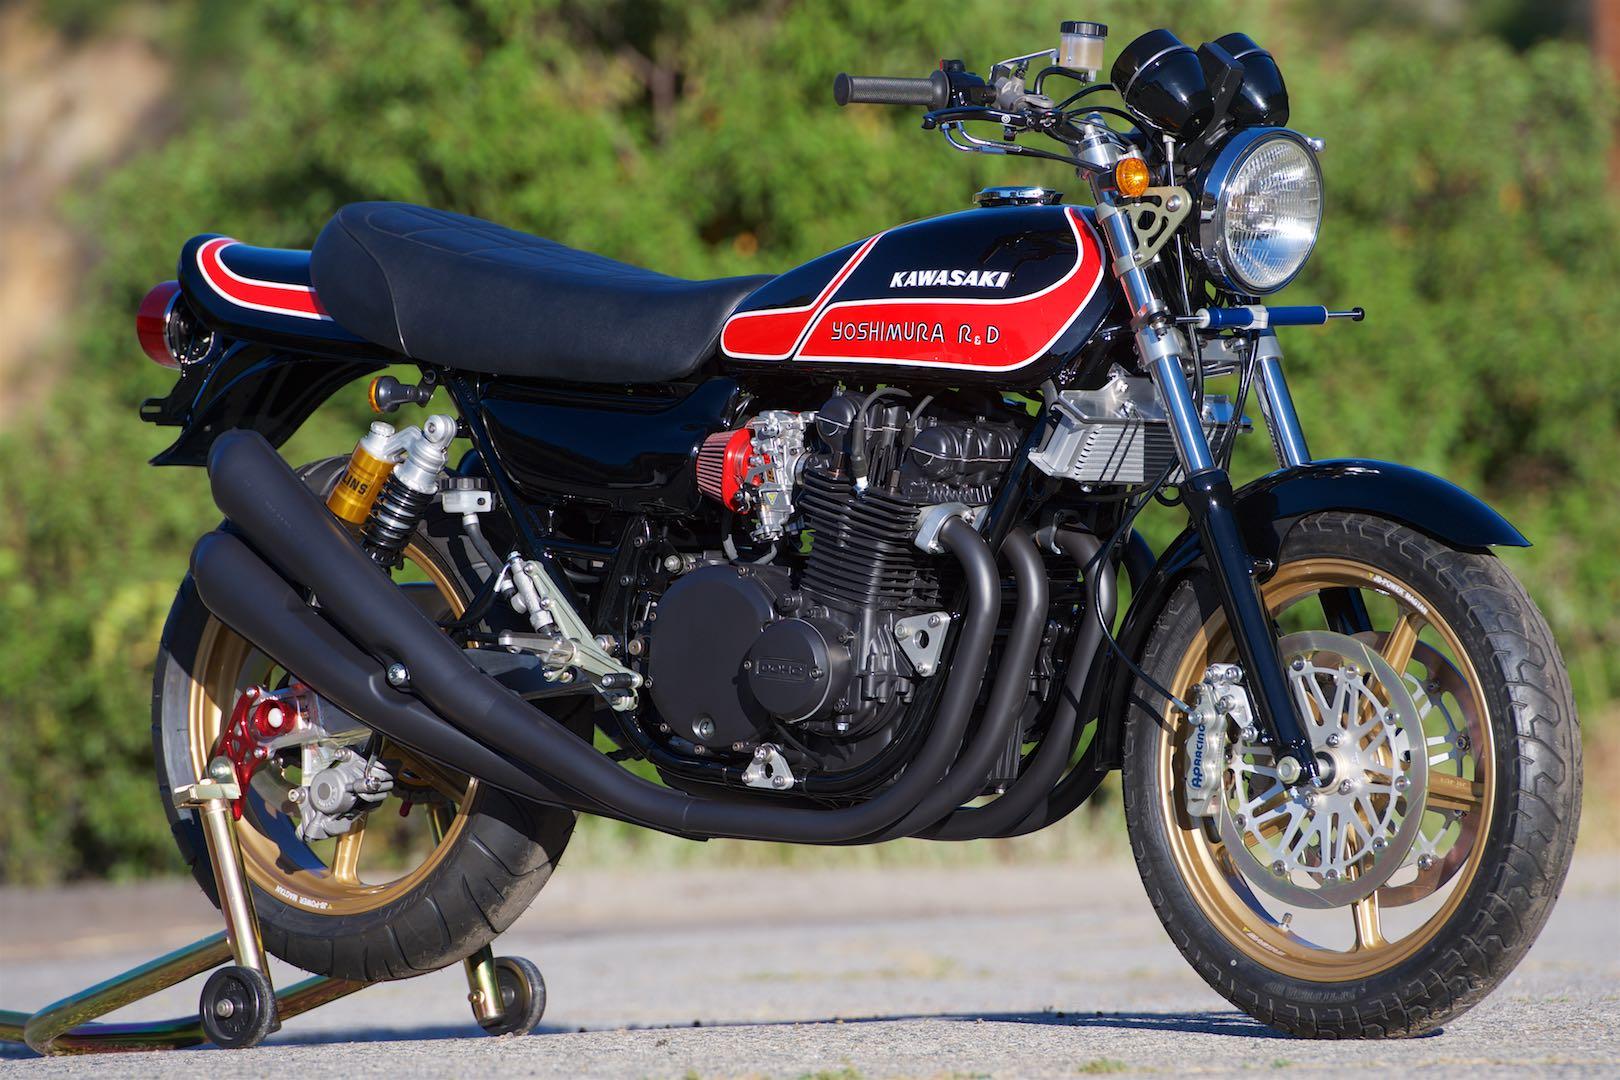 1976 Kawasaki KZ900 custom motorcycle